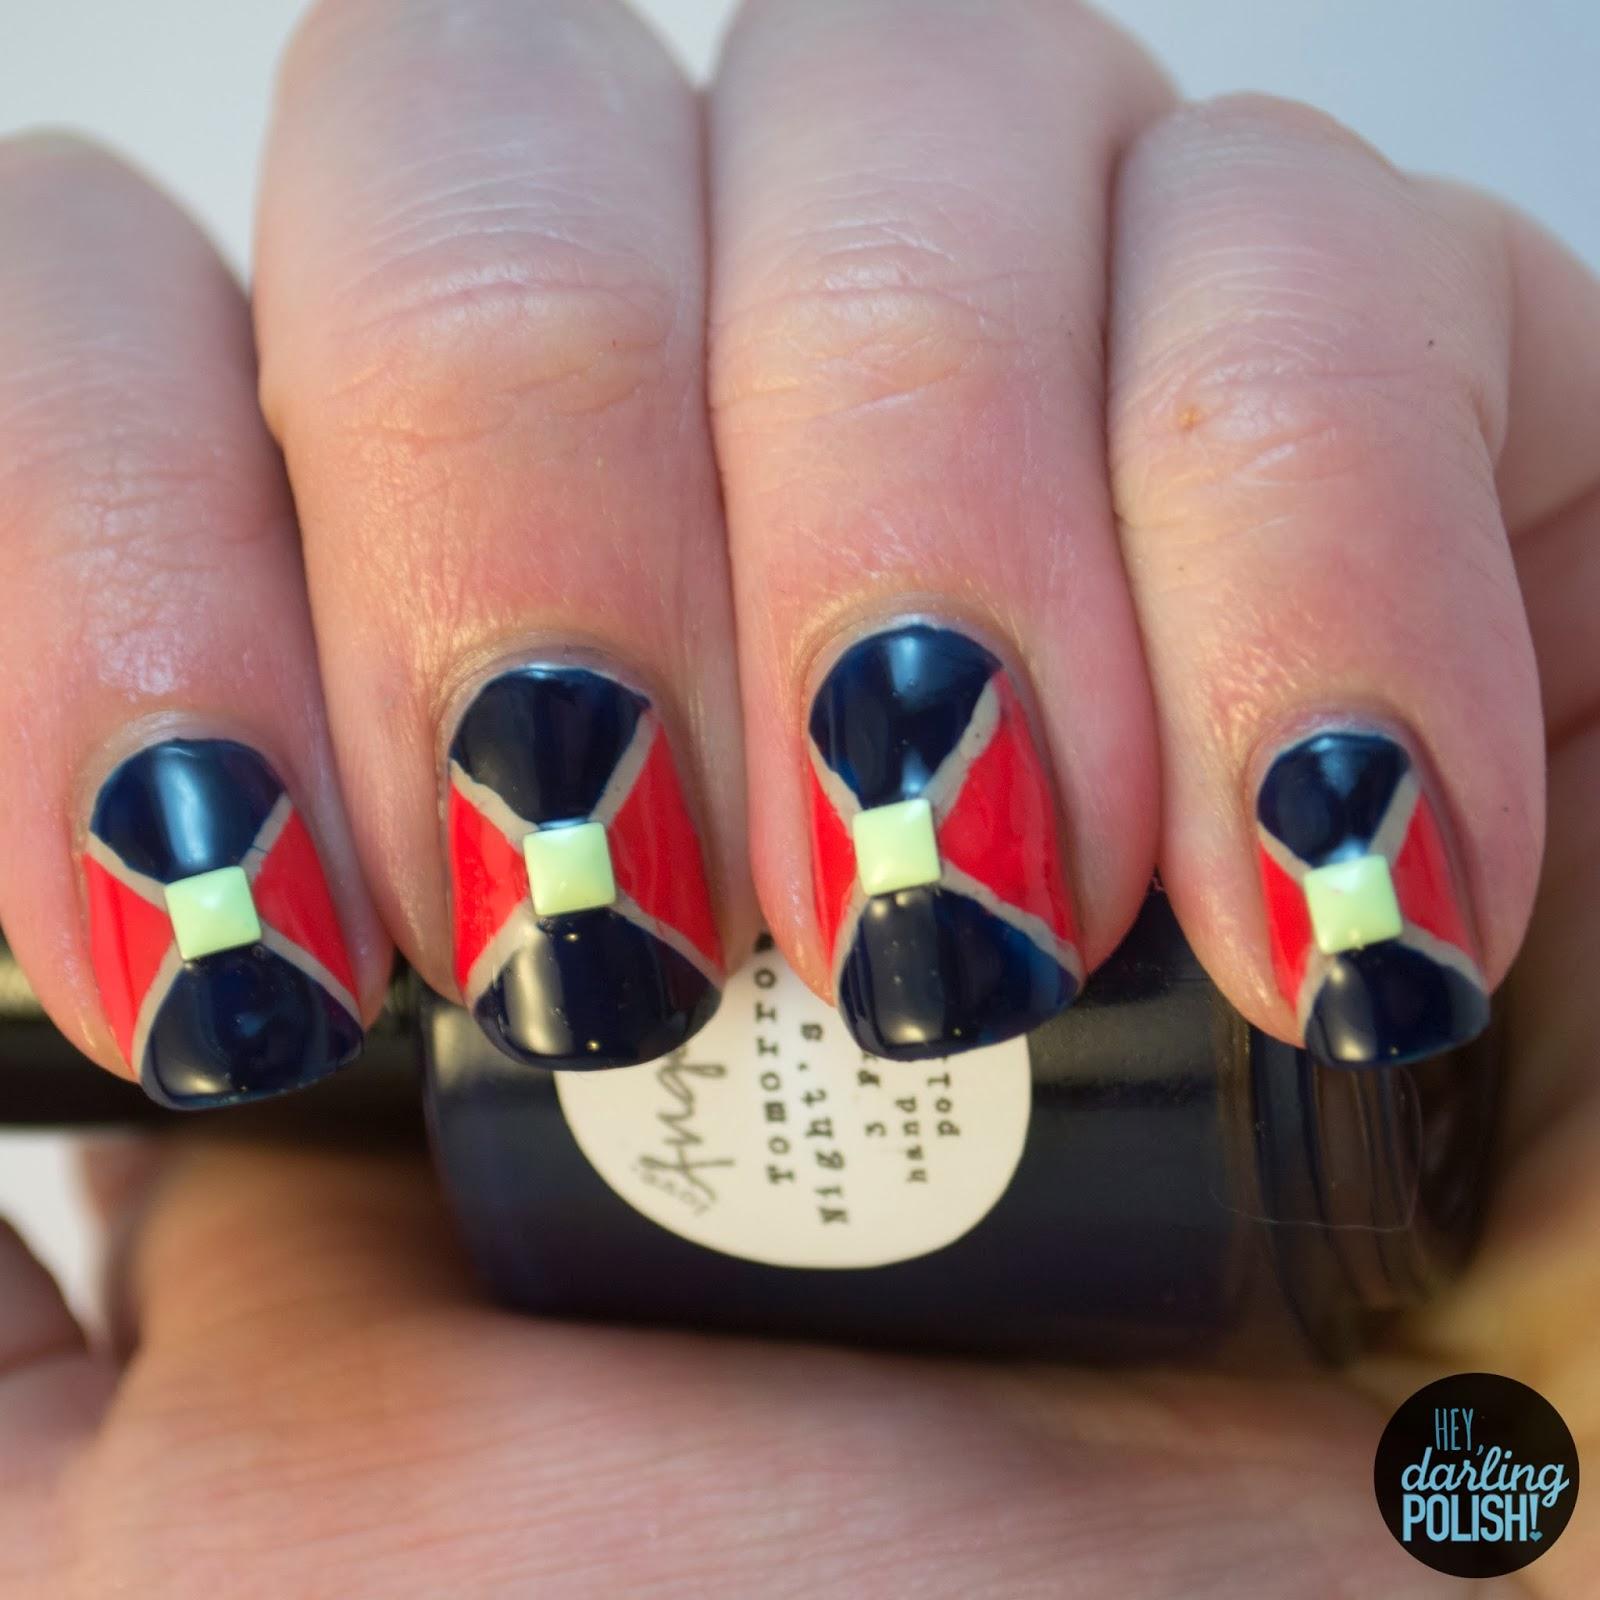 nails, nail polish, nail art, geometric, triangles, studs, hey darling polish, theme buffet,